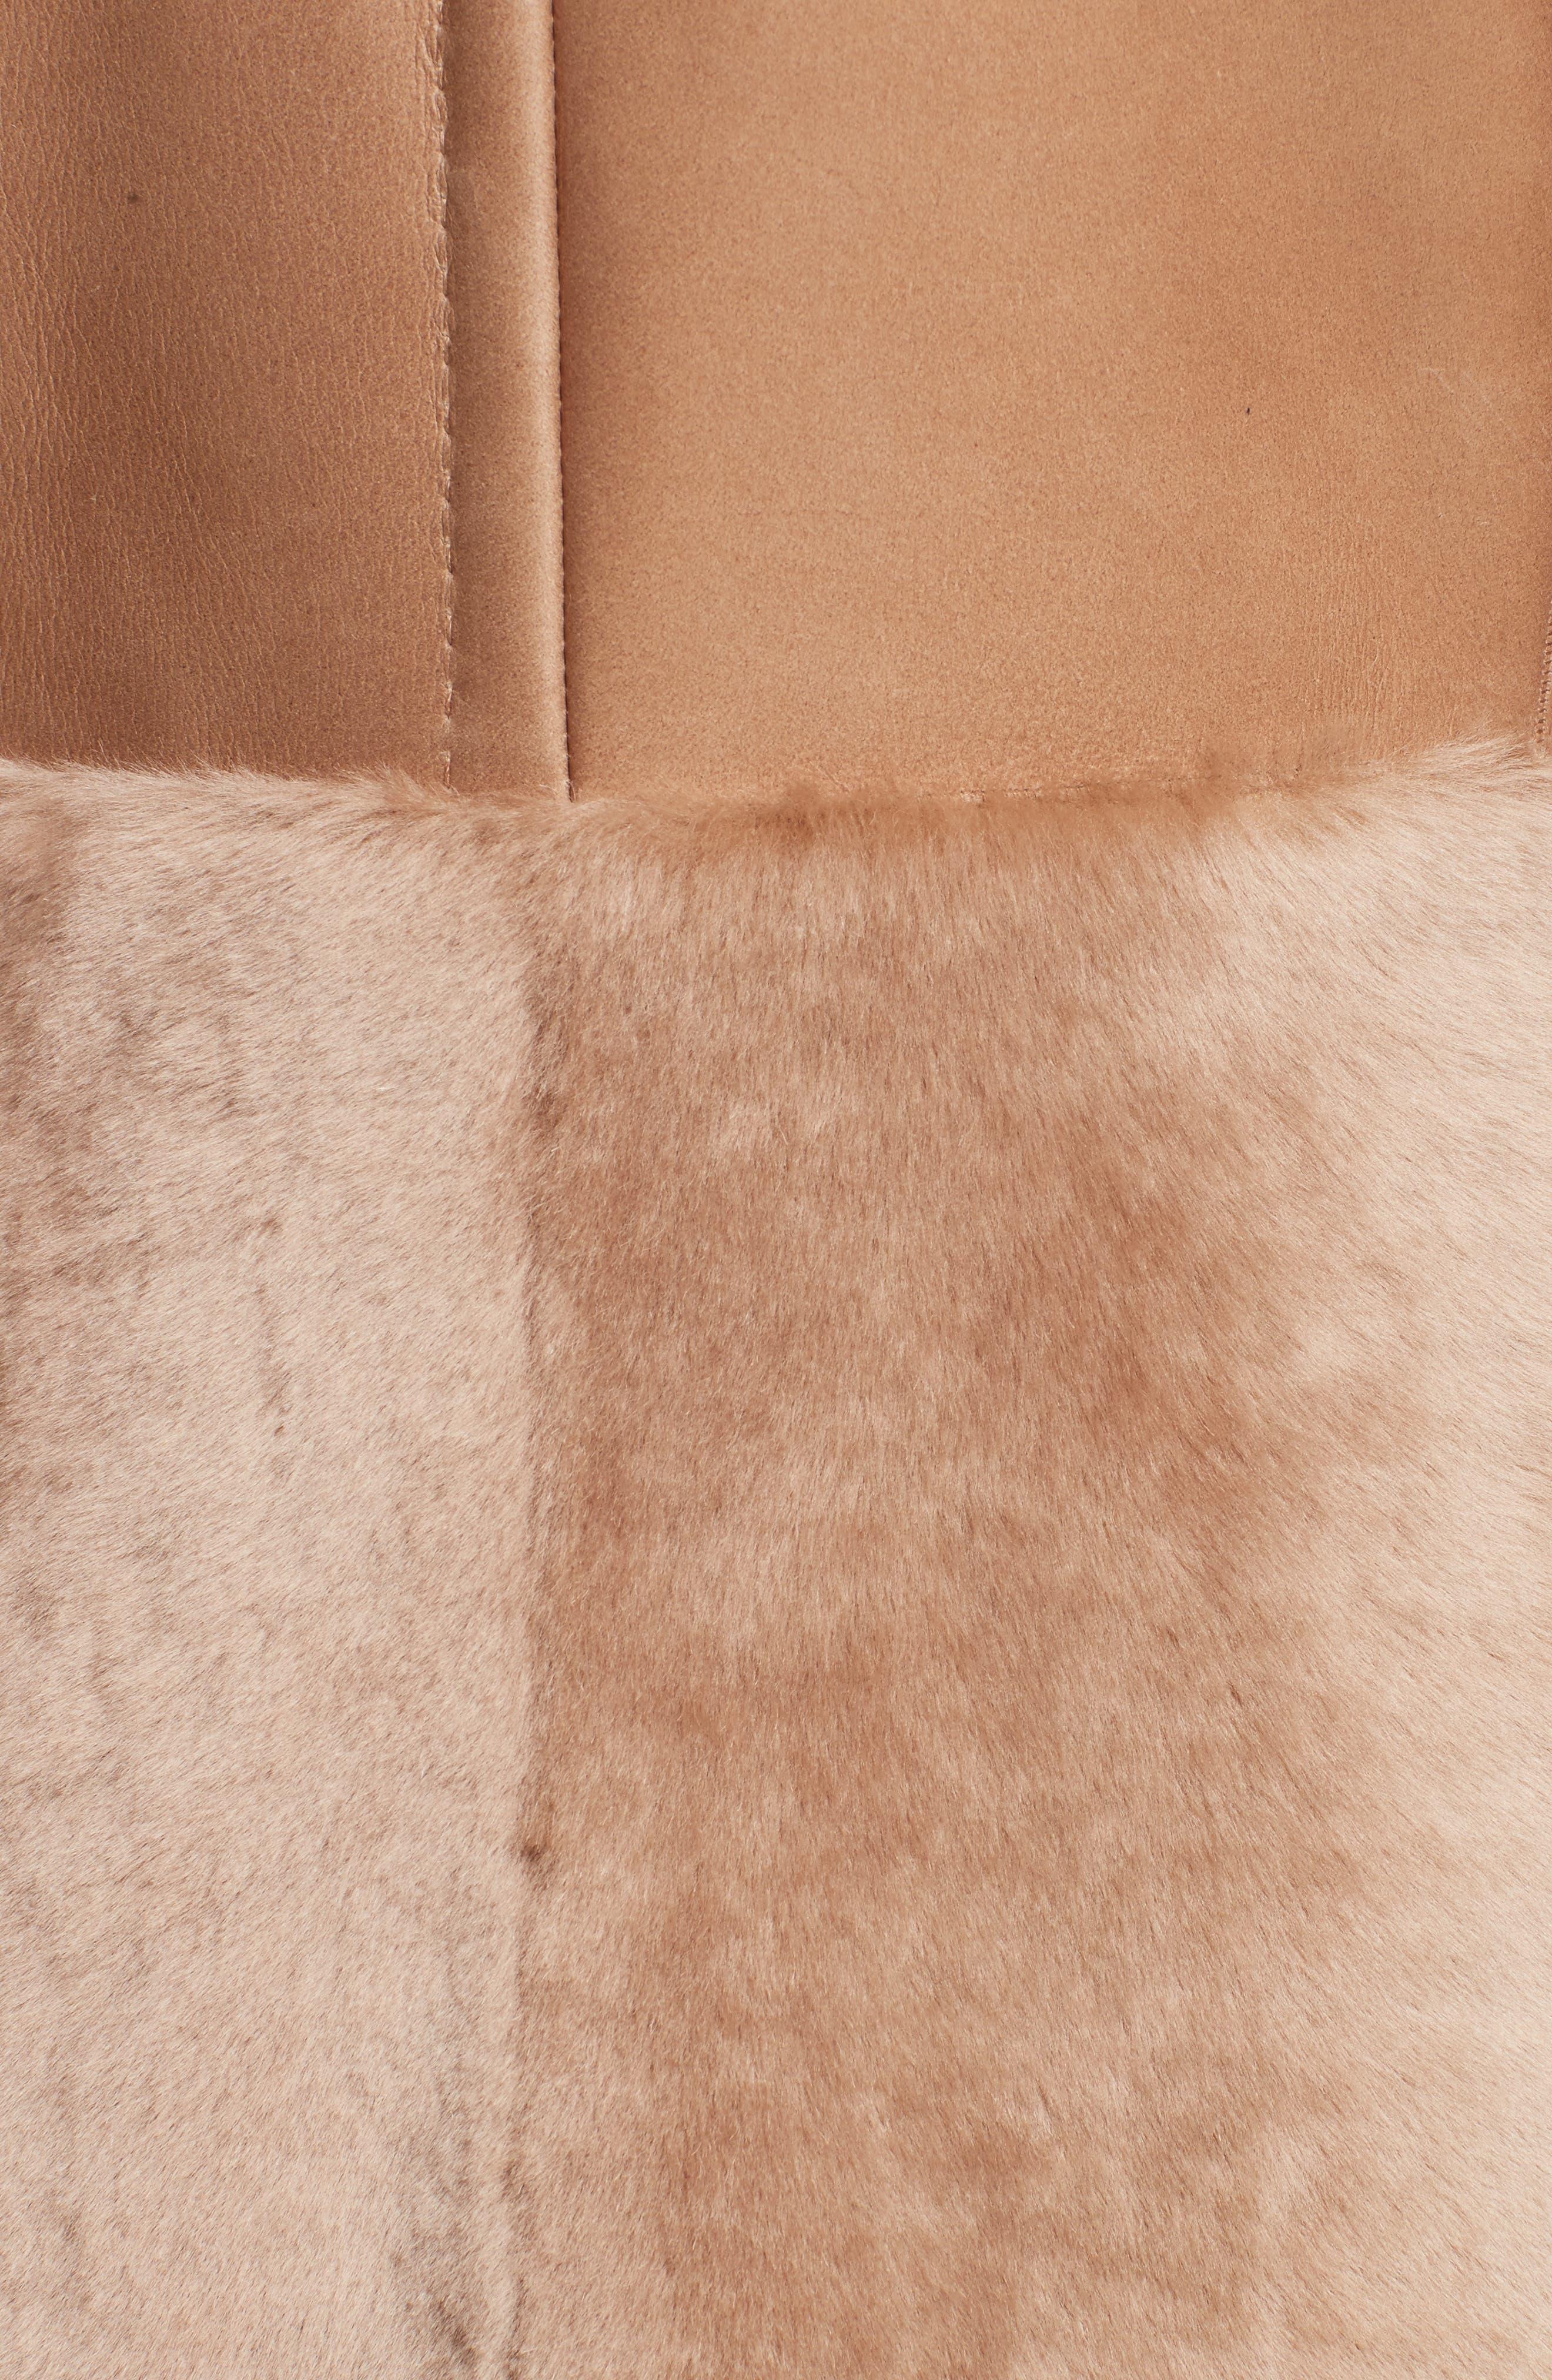 Rimini Genuine Shearling Coat,                             Alternate thumbnail 6, color,                             CAMEL